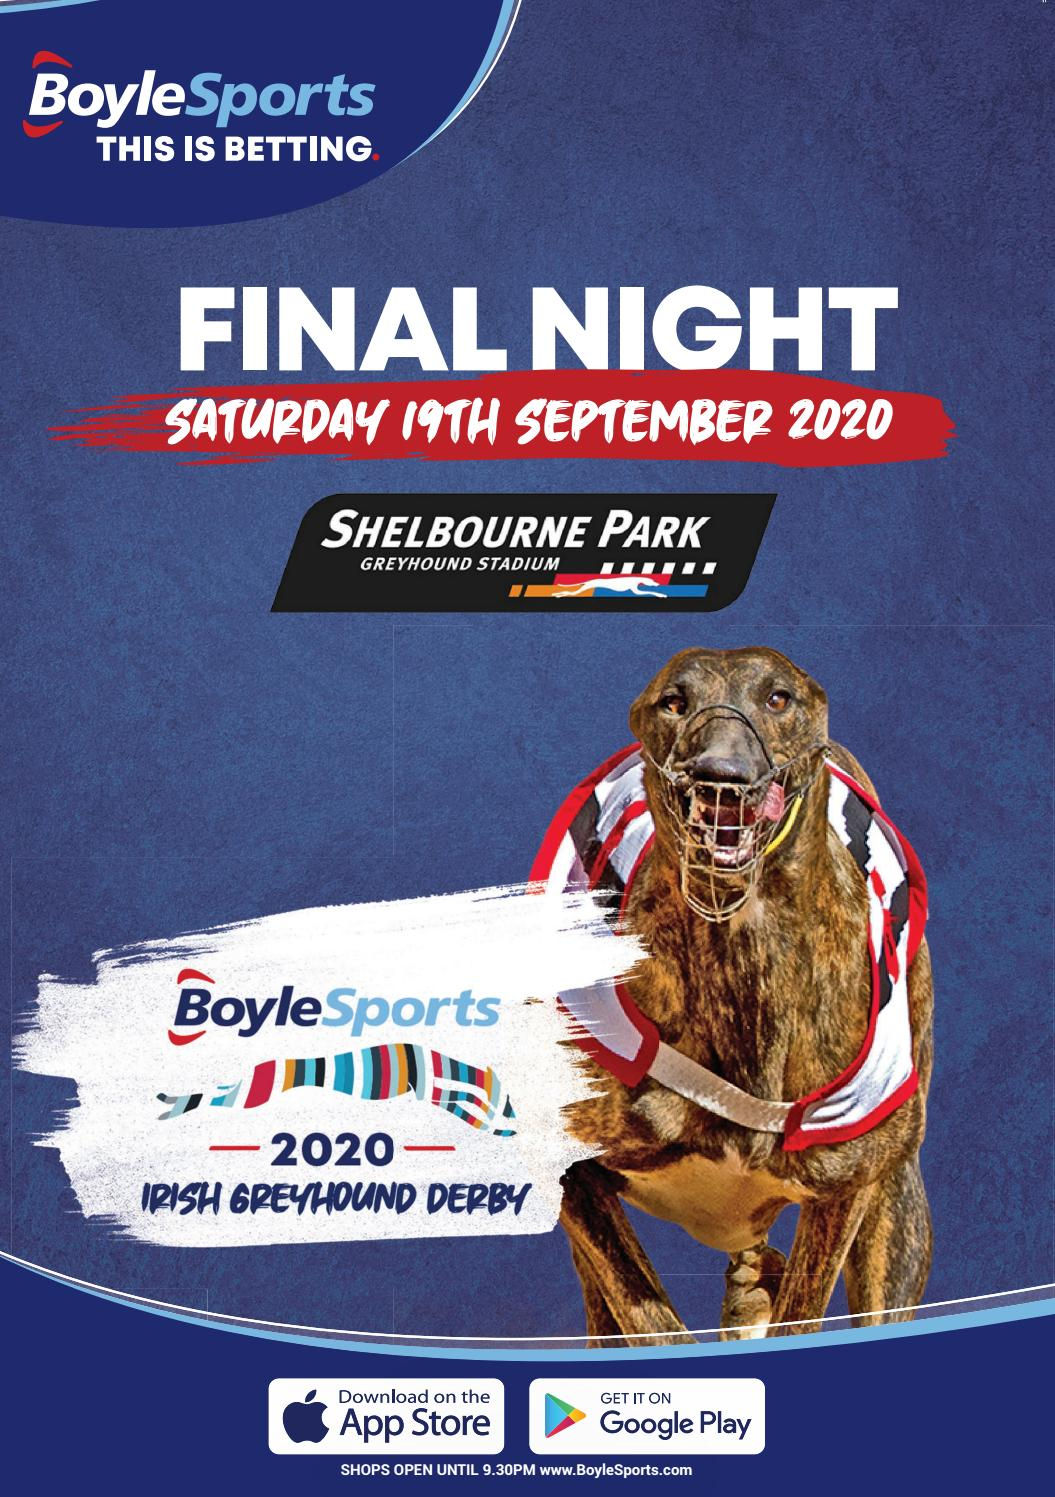 Irish greyhound derby betting terms michael fishman sports betting tech